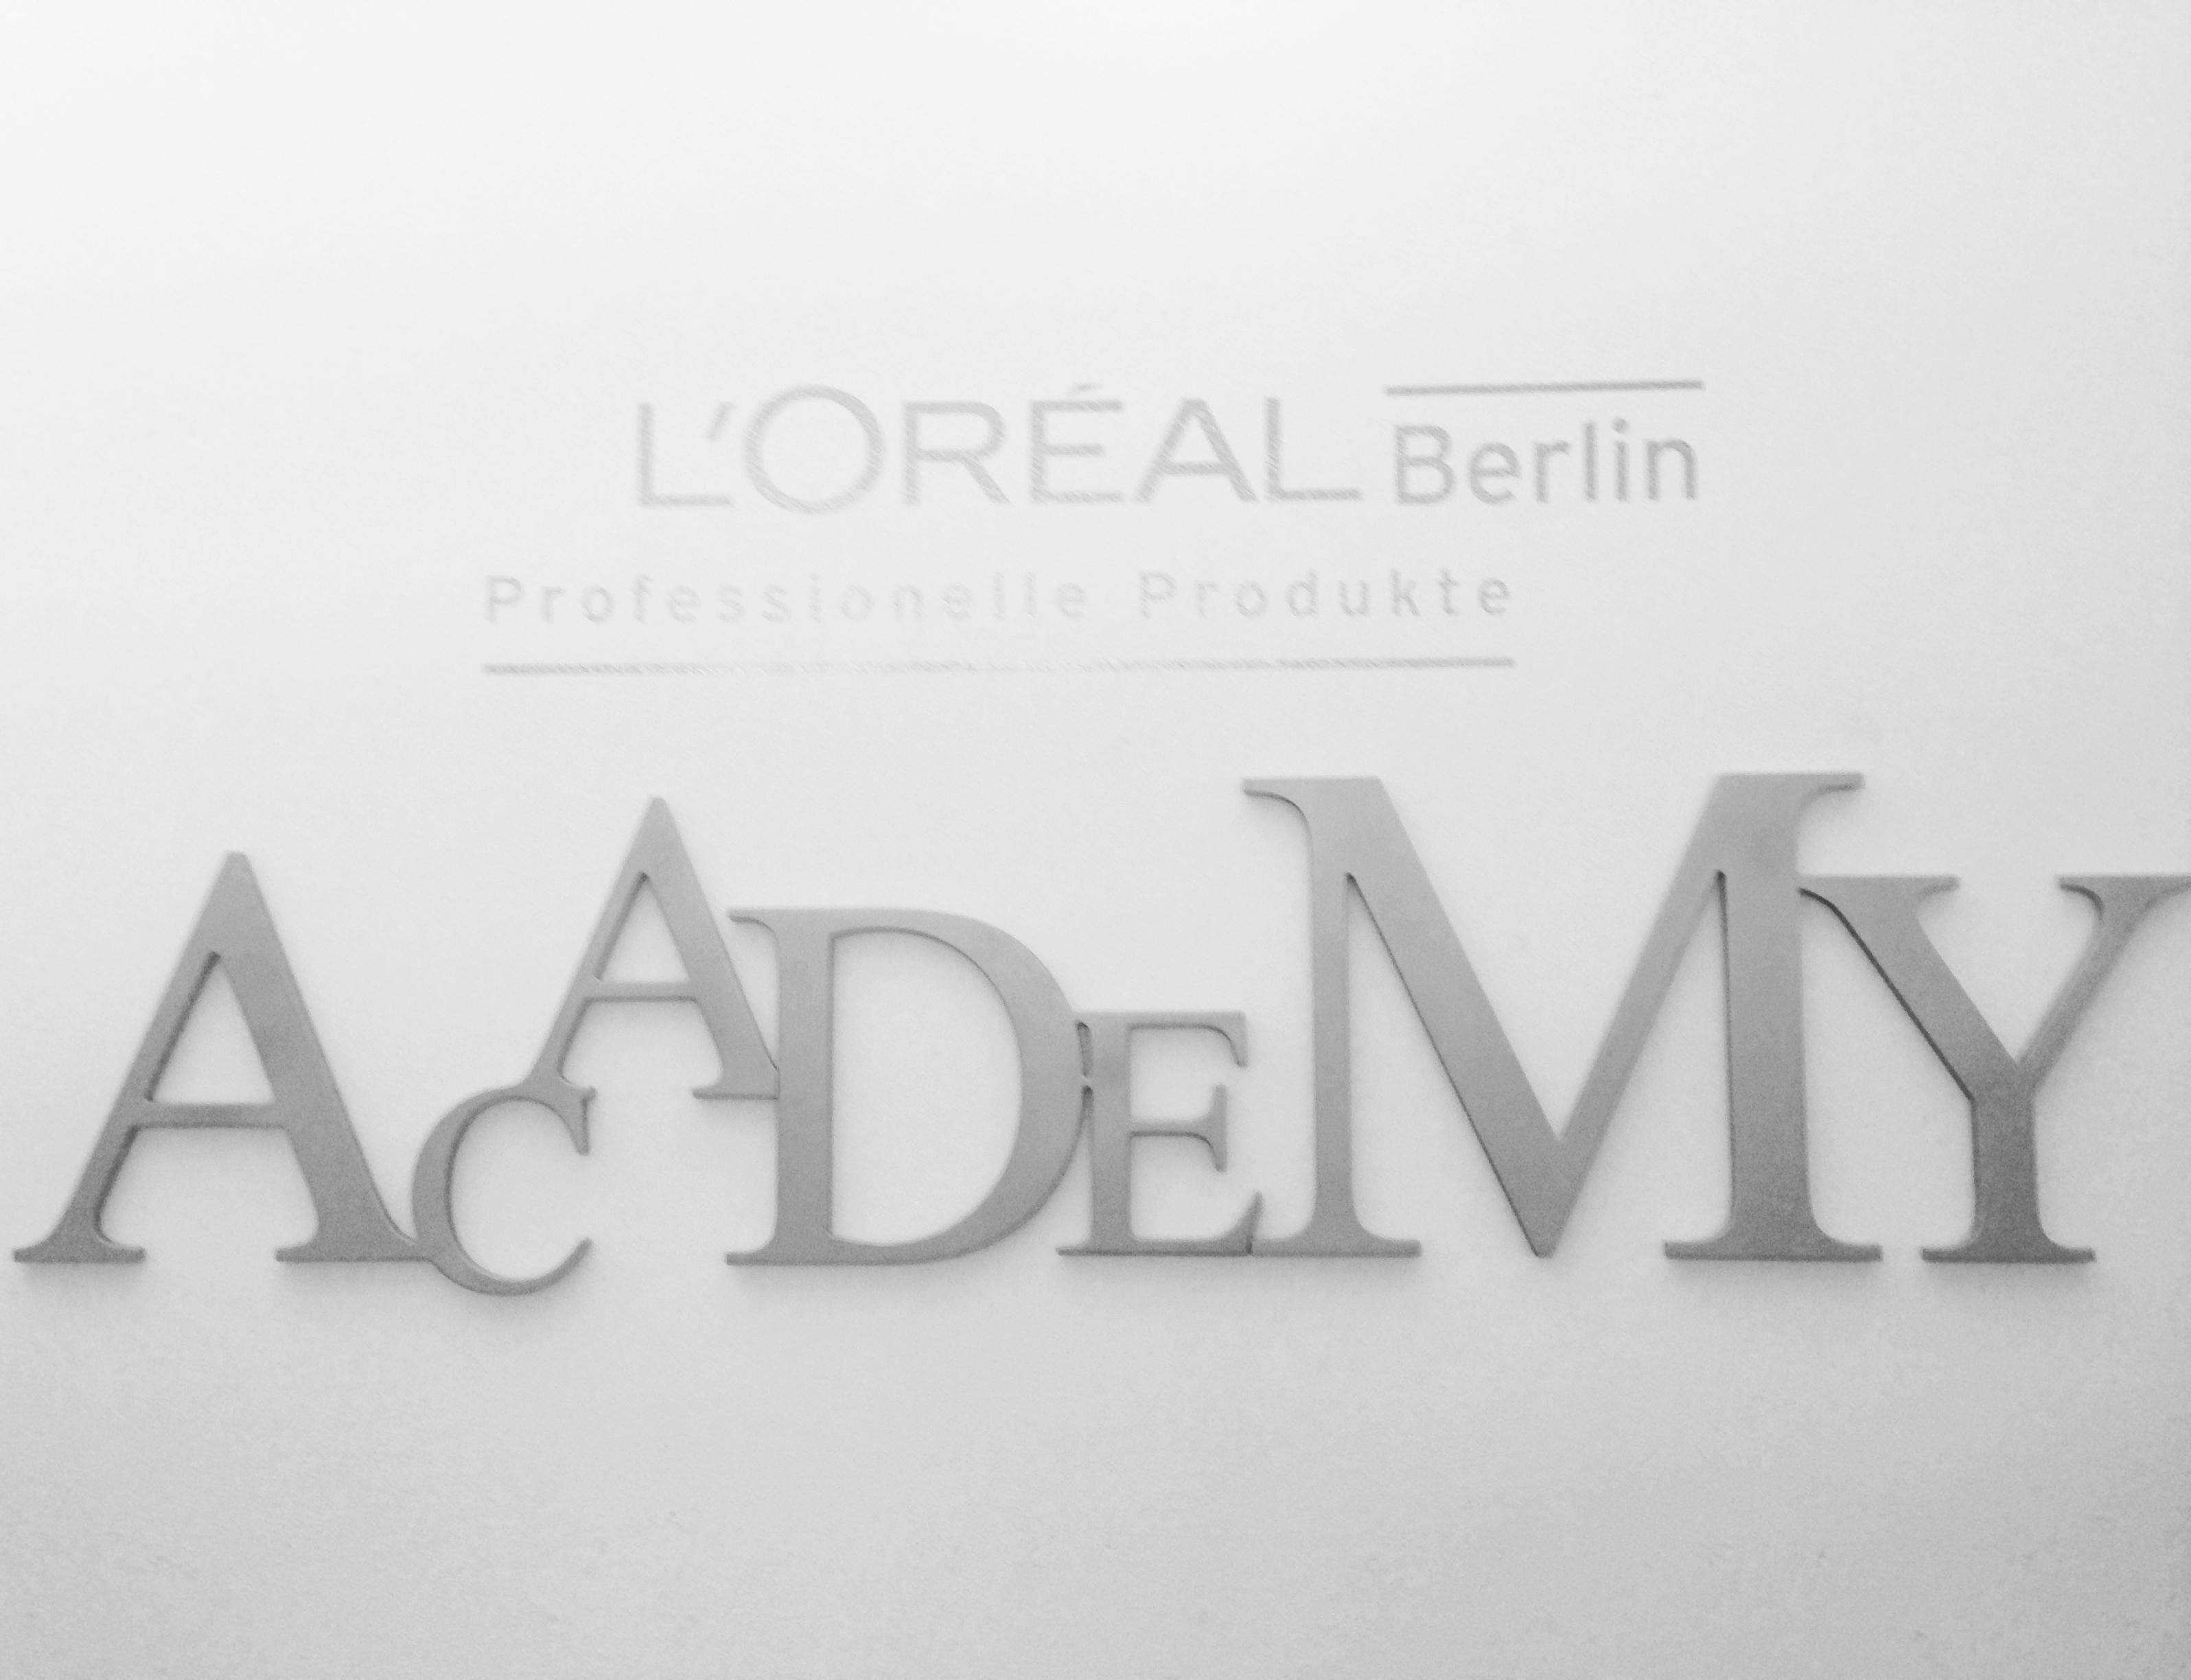 loreal academy